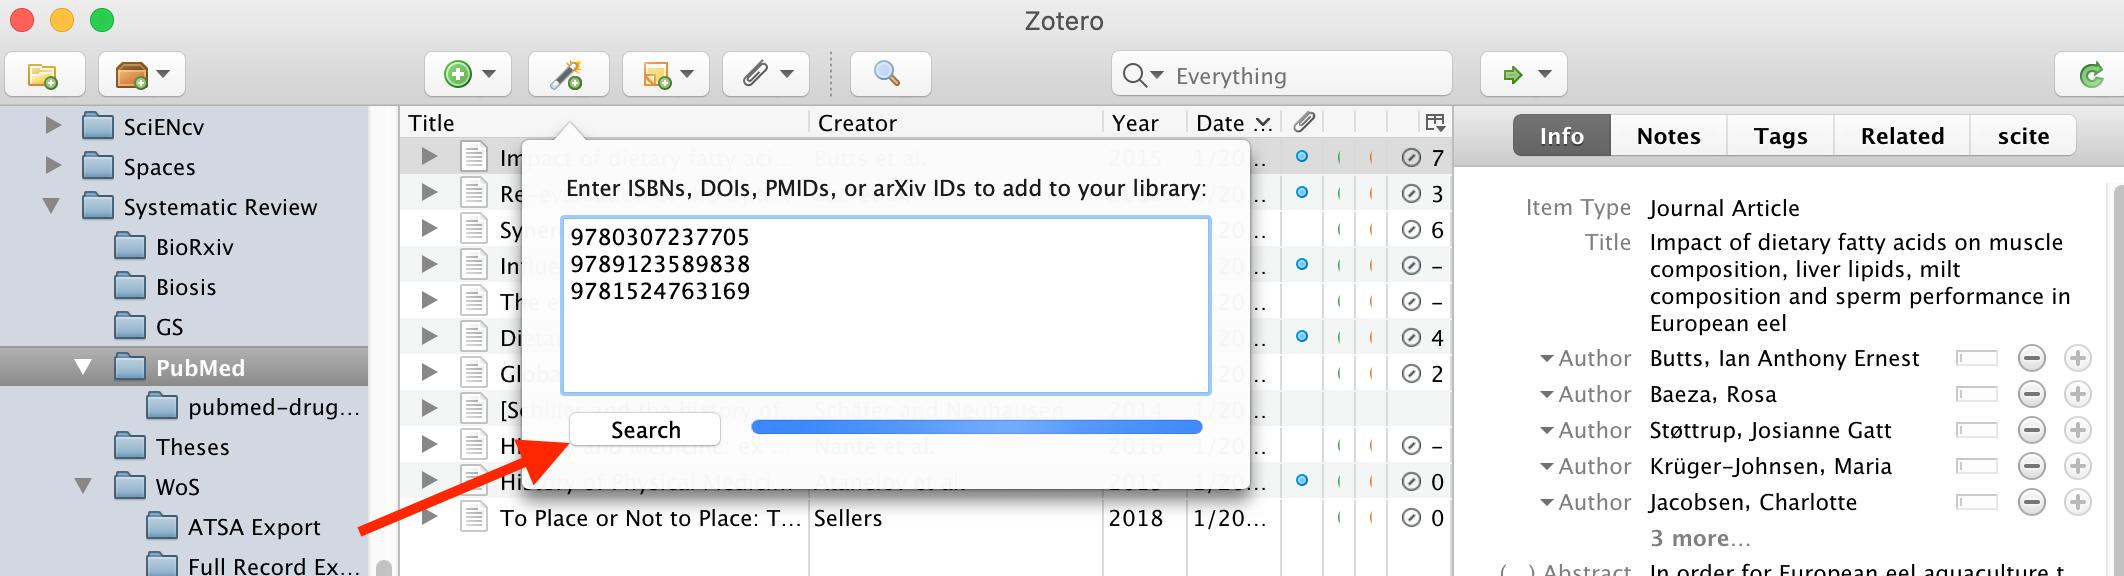 Add list visual example